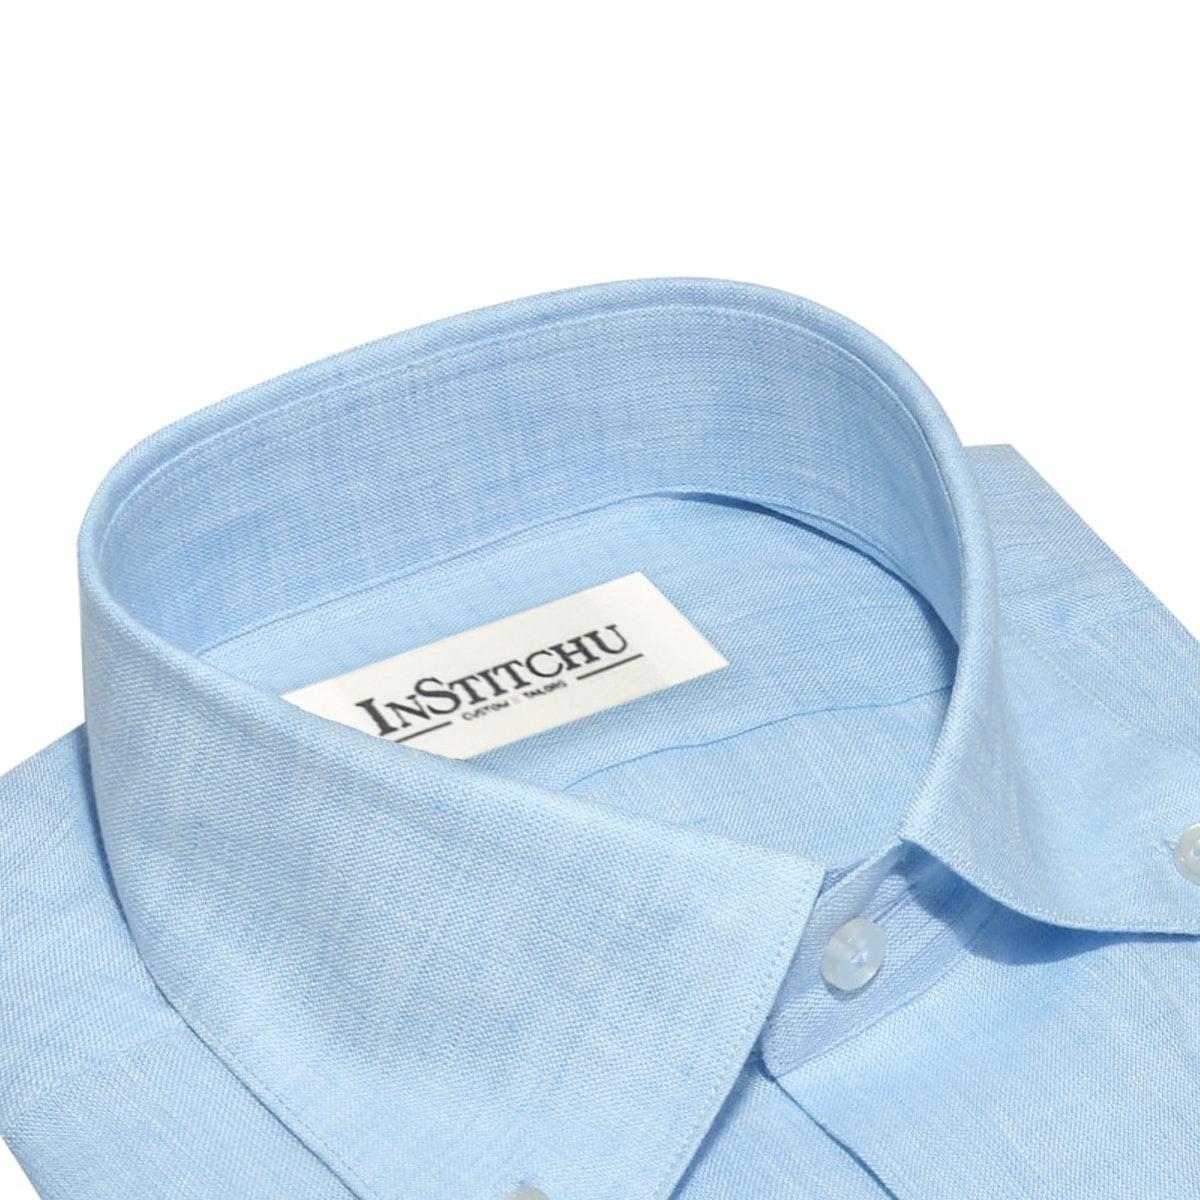 InStitchu Collection The Encinitas Light Blue Linen Shirt